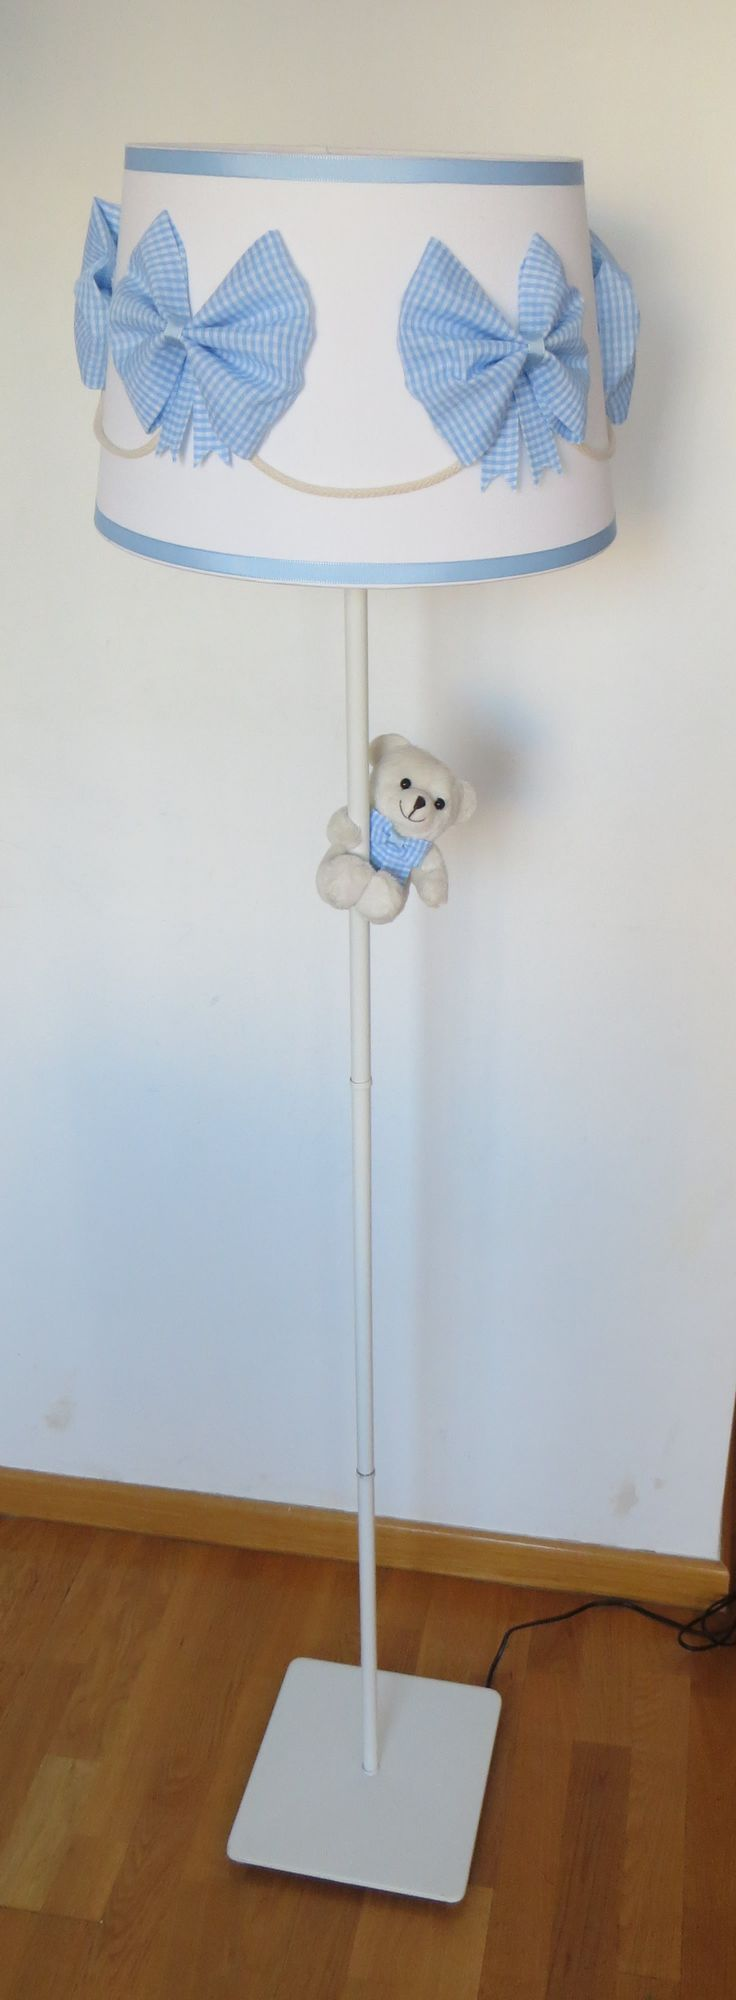 lampara pie bebe azul osito (1)